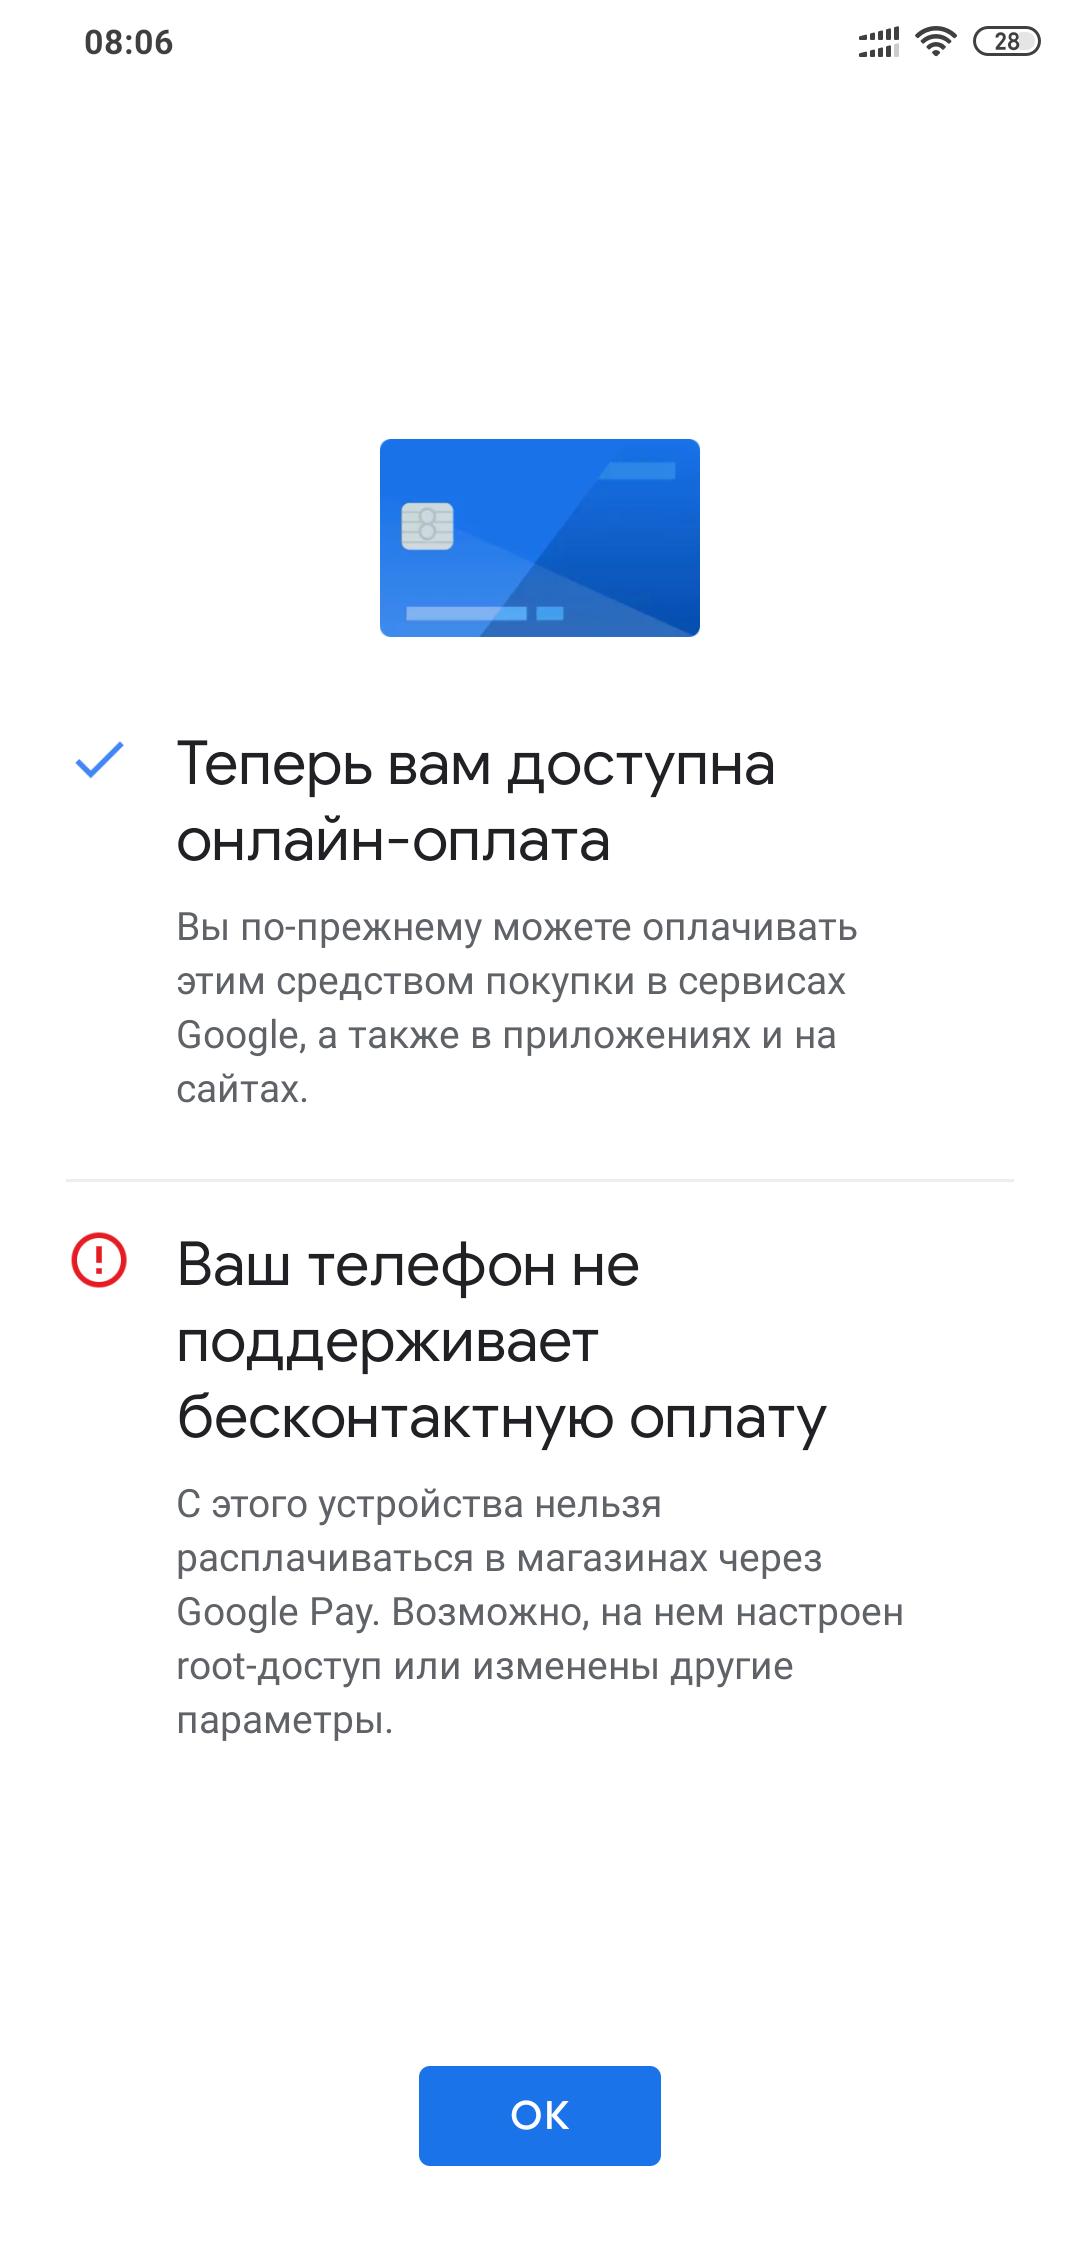 Screenshot_2019-03-02-08-06-07-593_com.google.android.gms.png